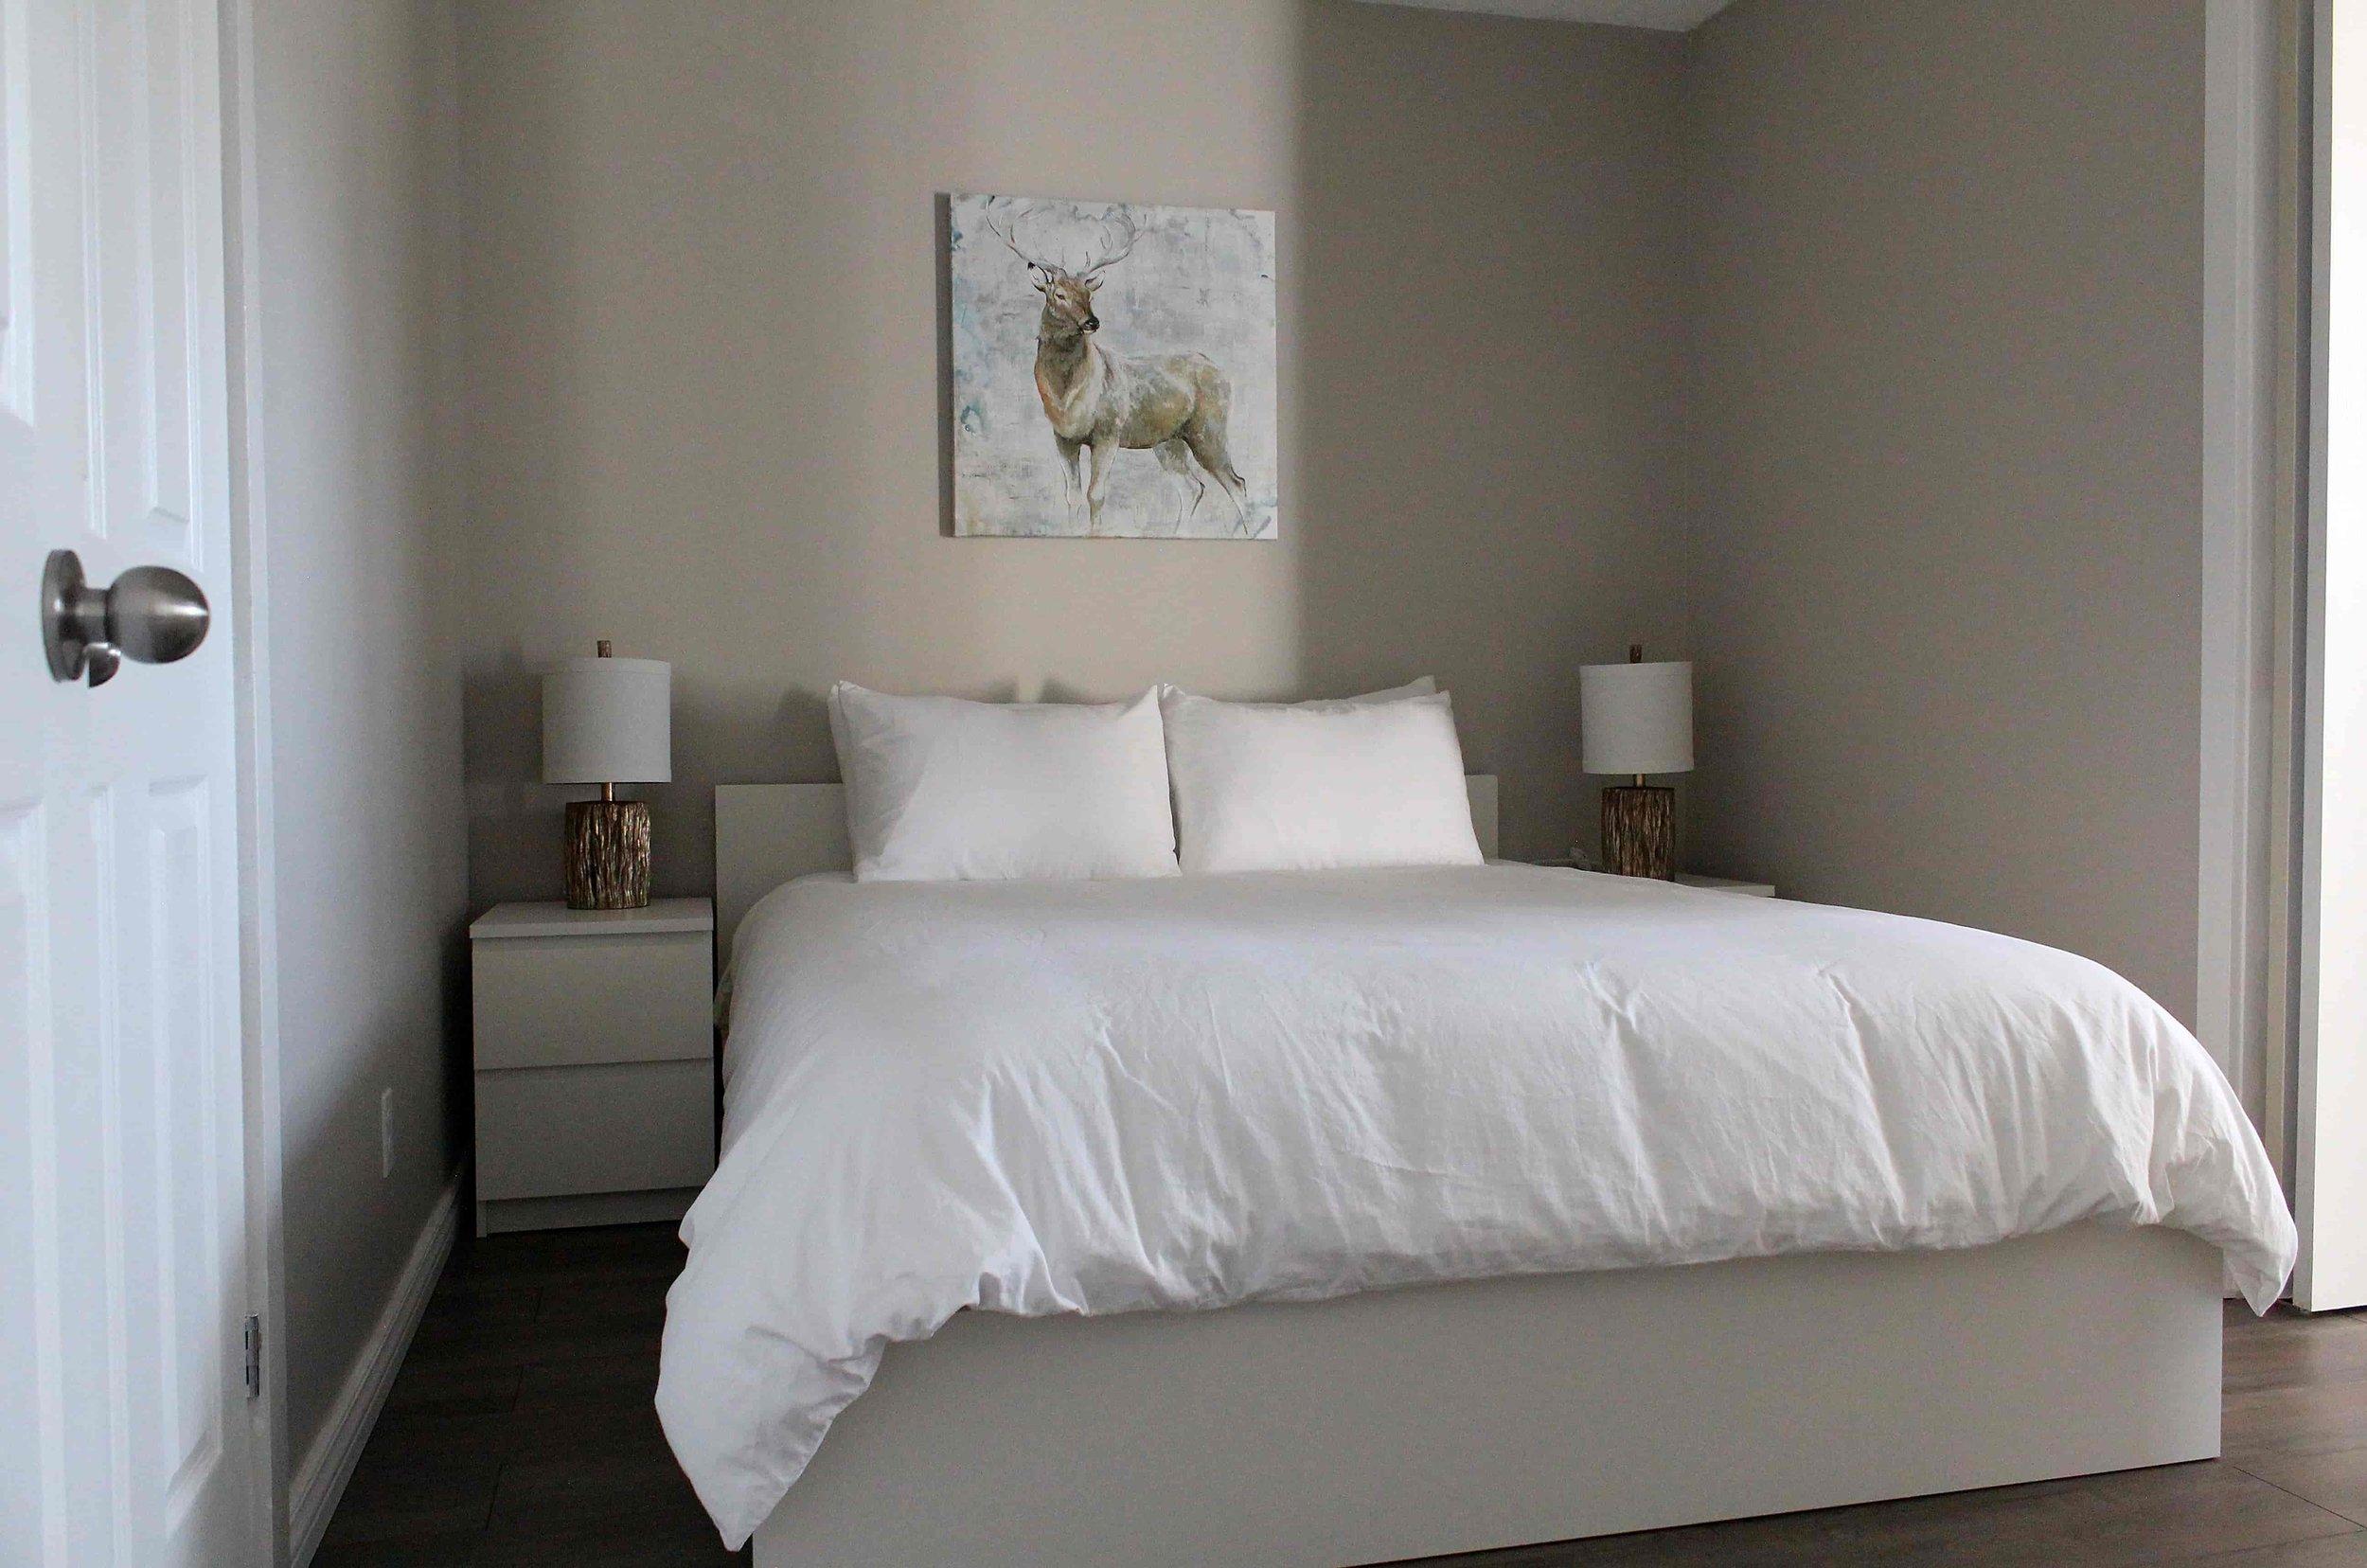 8_Moose_Lodge_Master_Bedroom-min.jpg